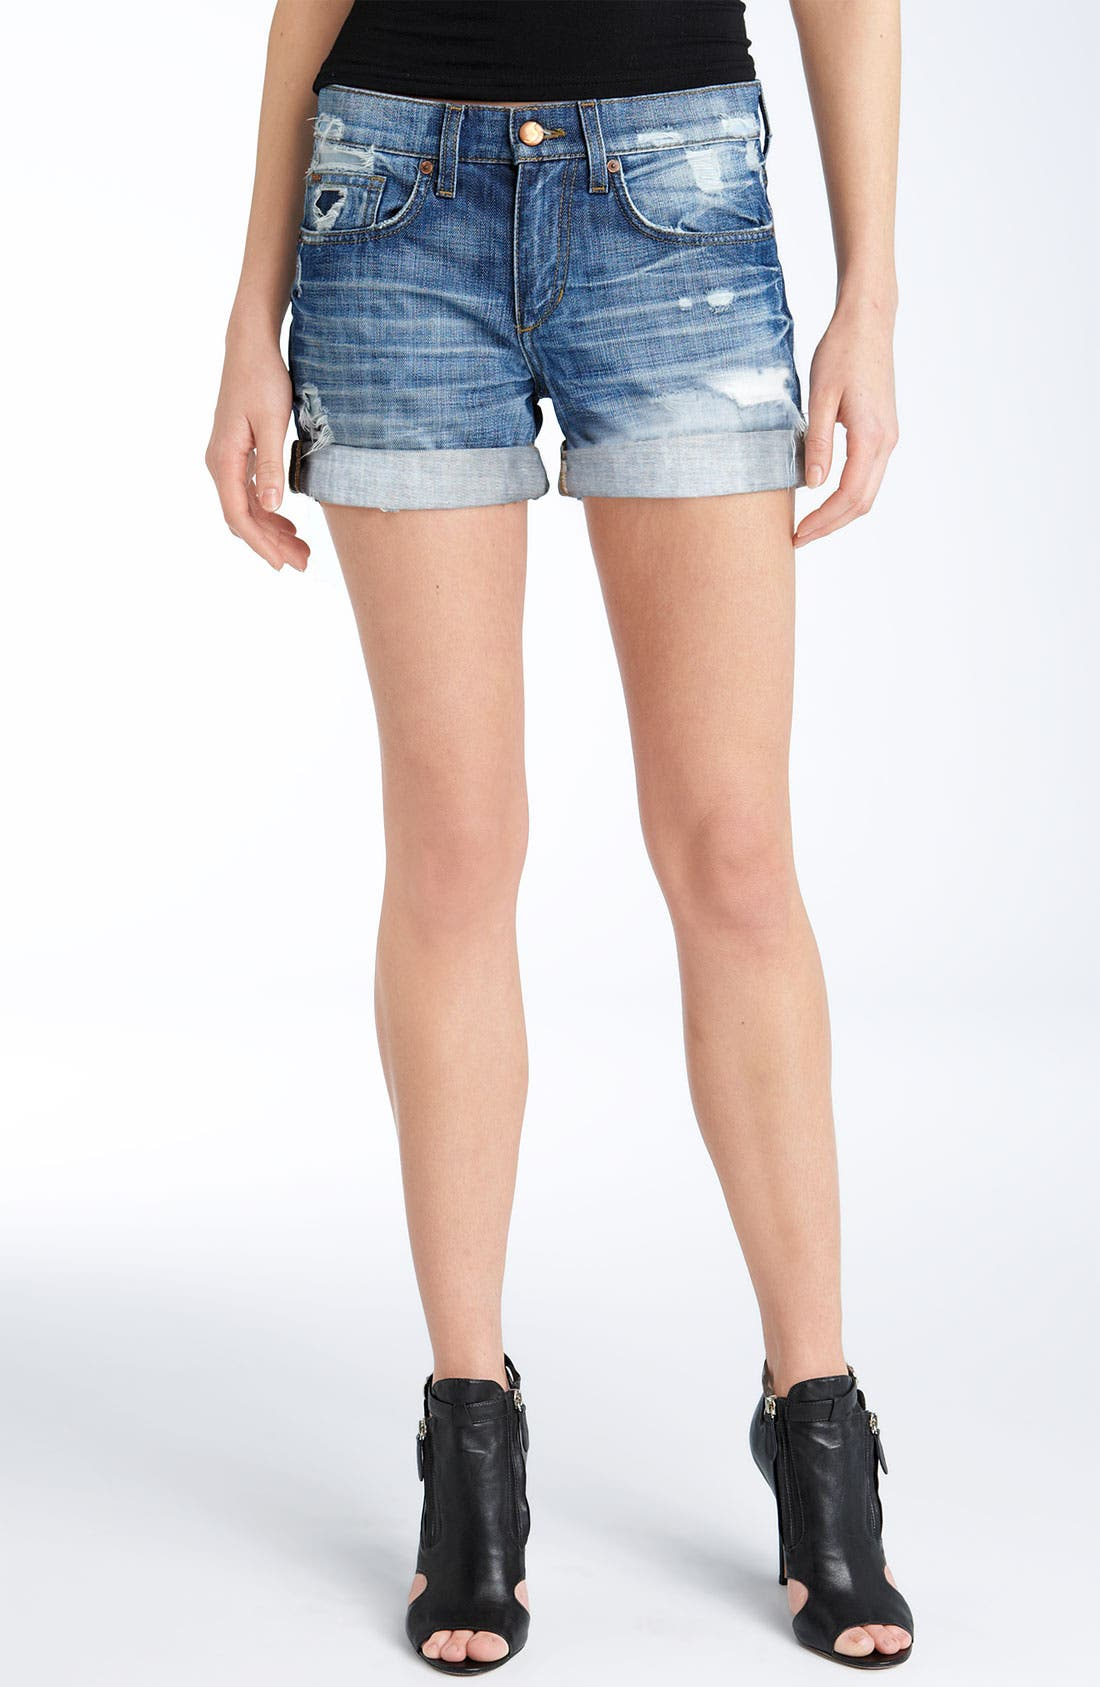 Alternate Image 1 Selected - Joe's Loose Fit Denim Shorts (Blanchett Wash)